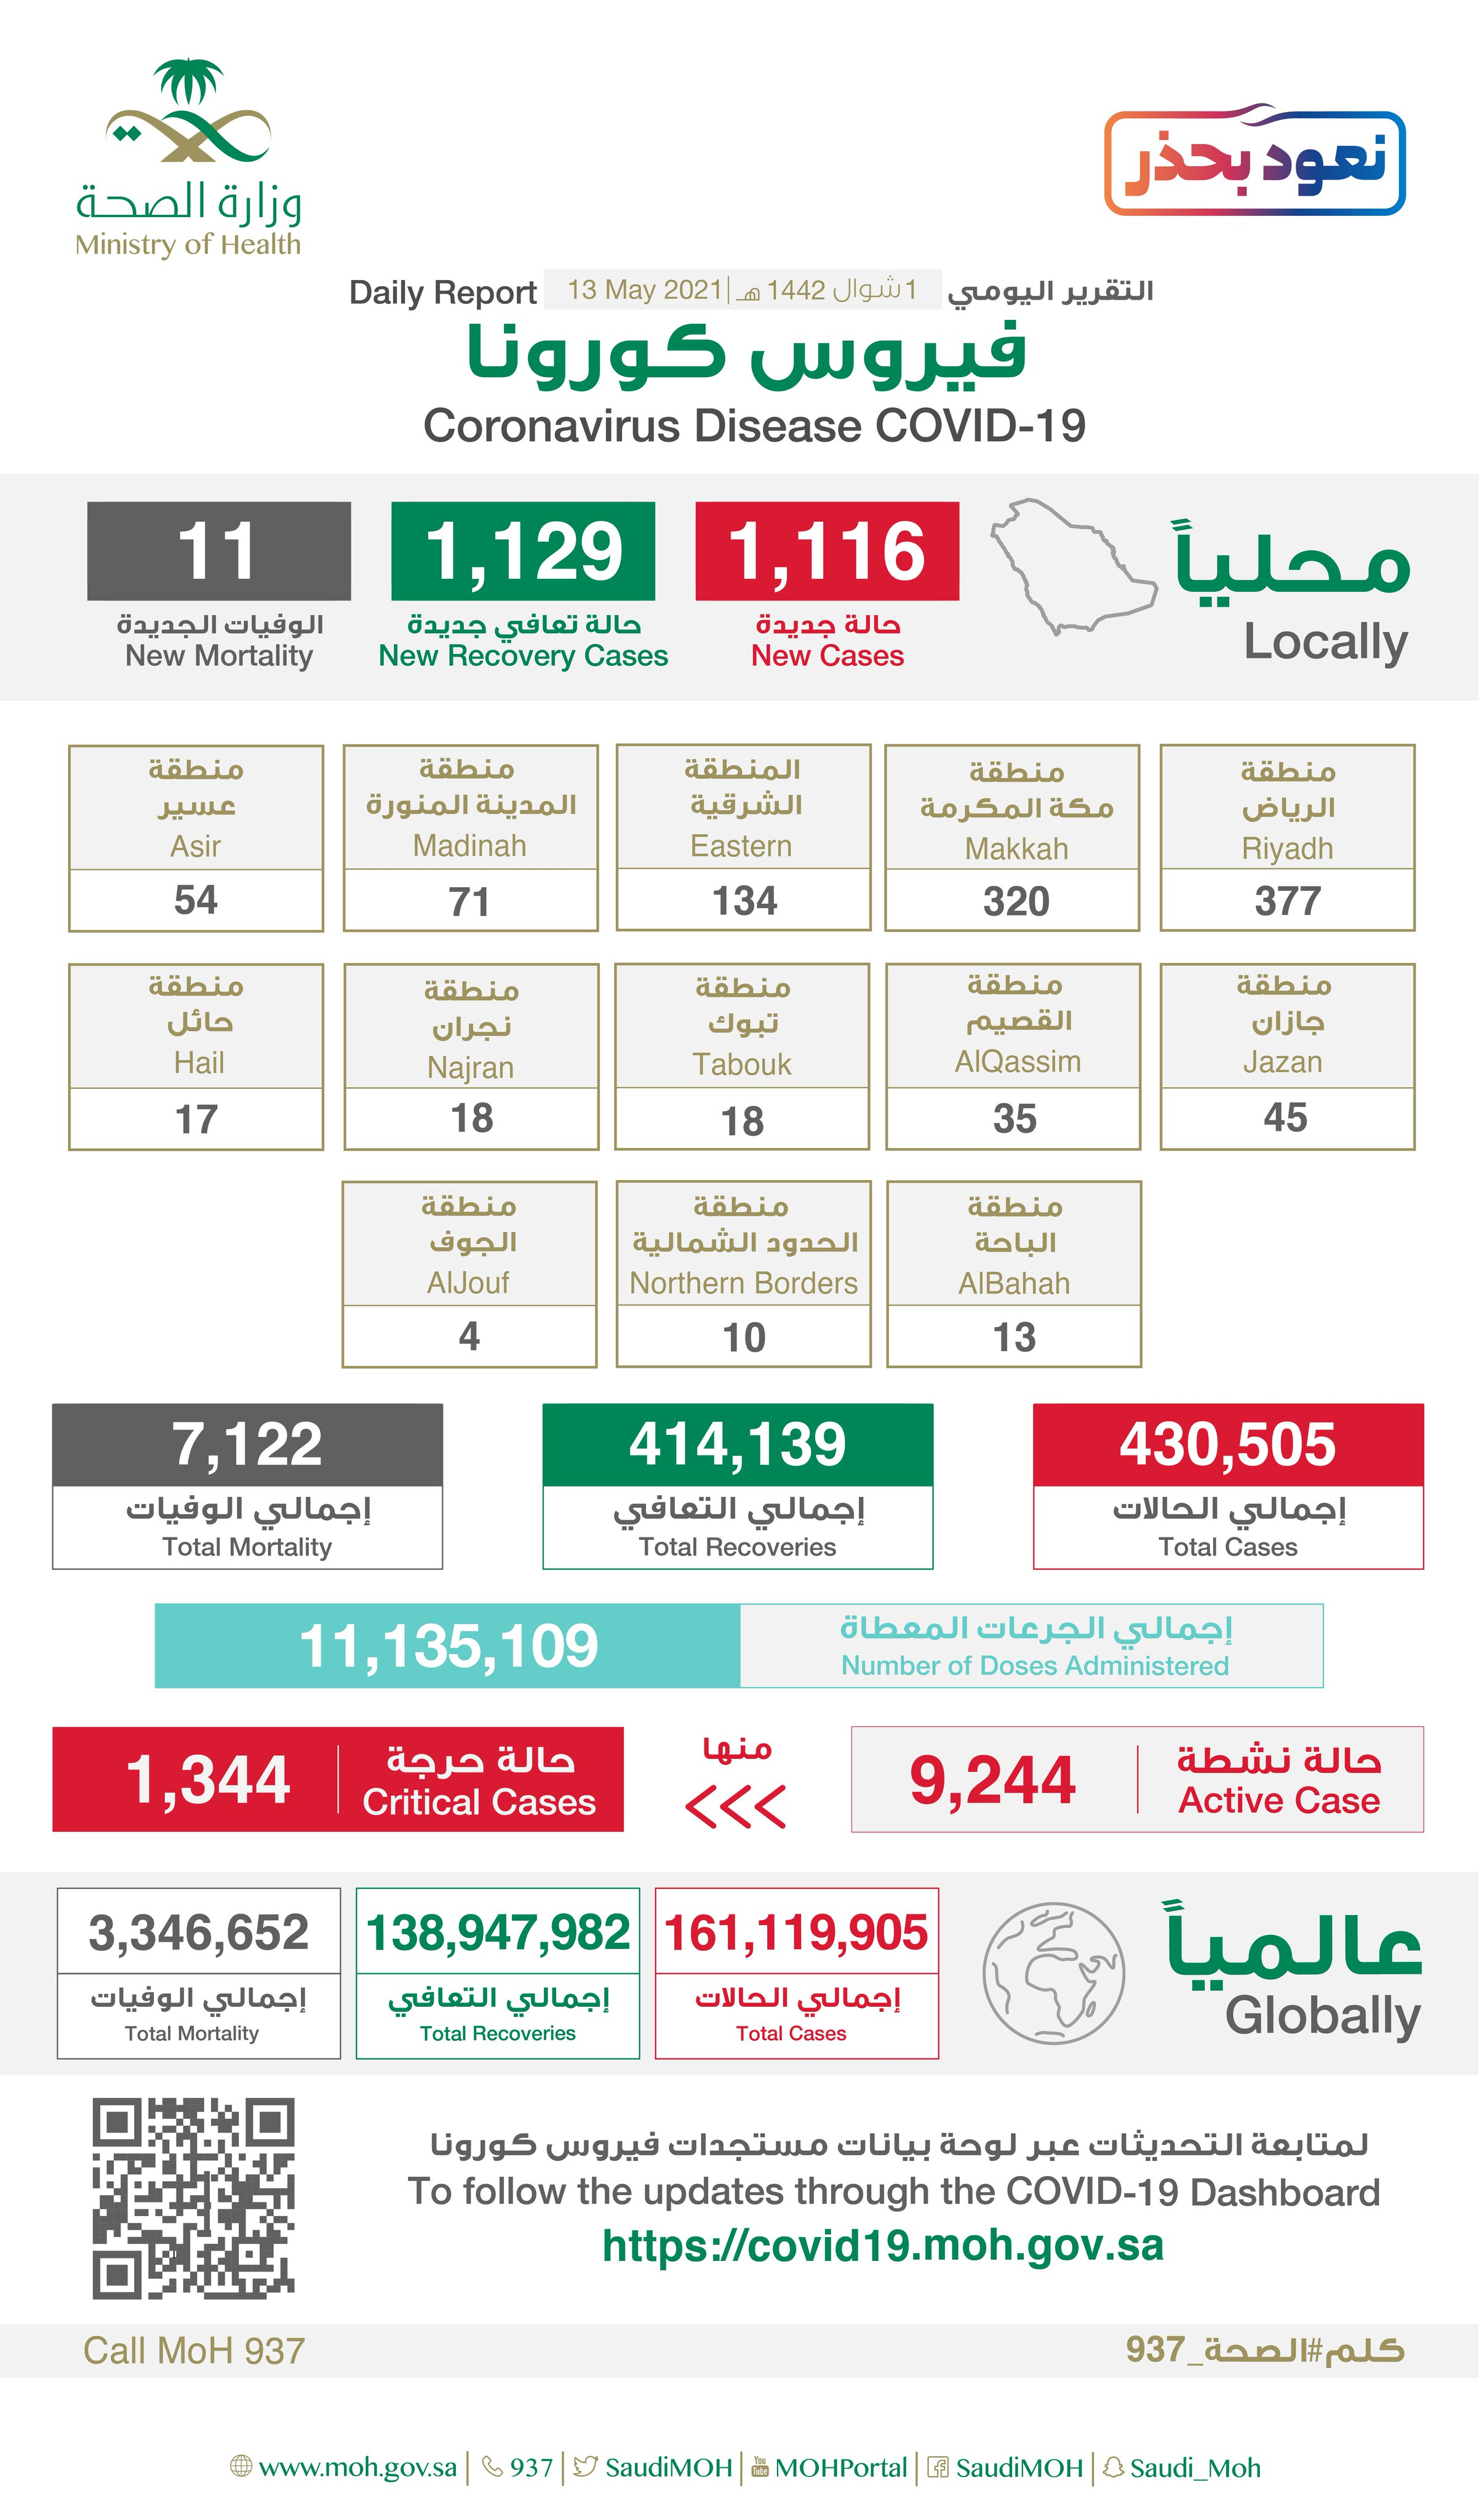 Saudi Arabia Coronavirus : Total Cases :430,505 , New Cases : 1,116 Cured : 414,139 , Deaths: 7,122, Active Cases : 9,244